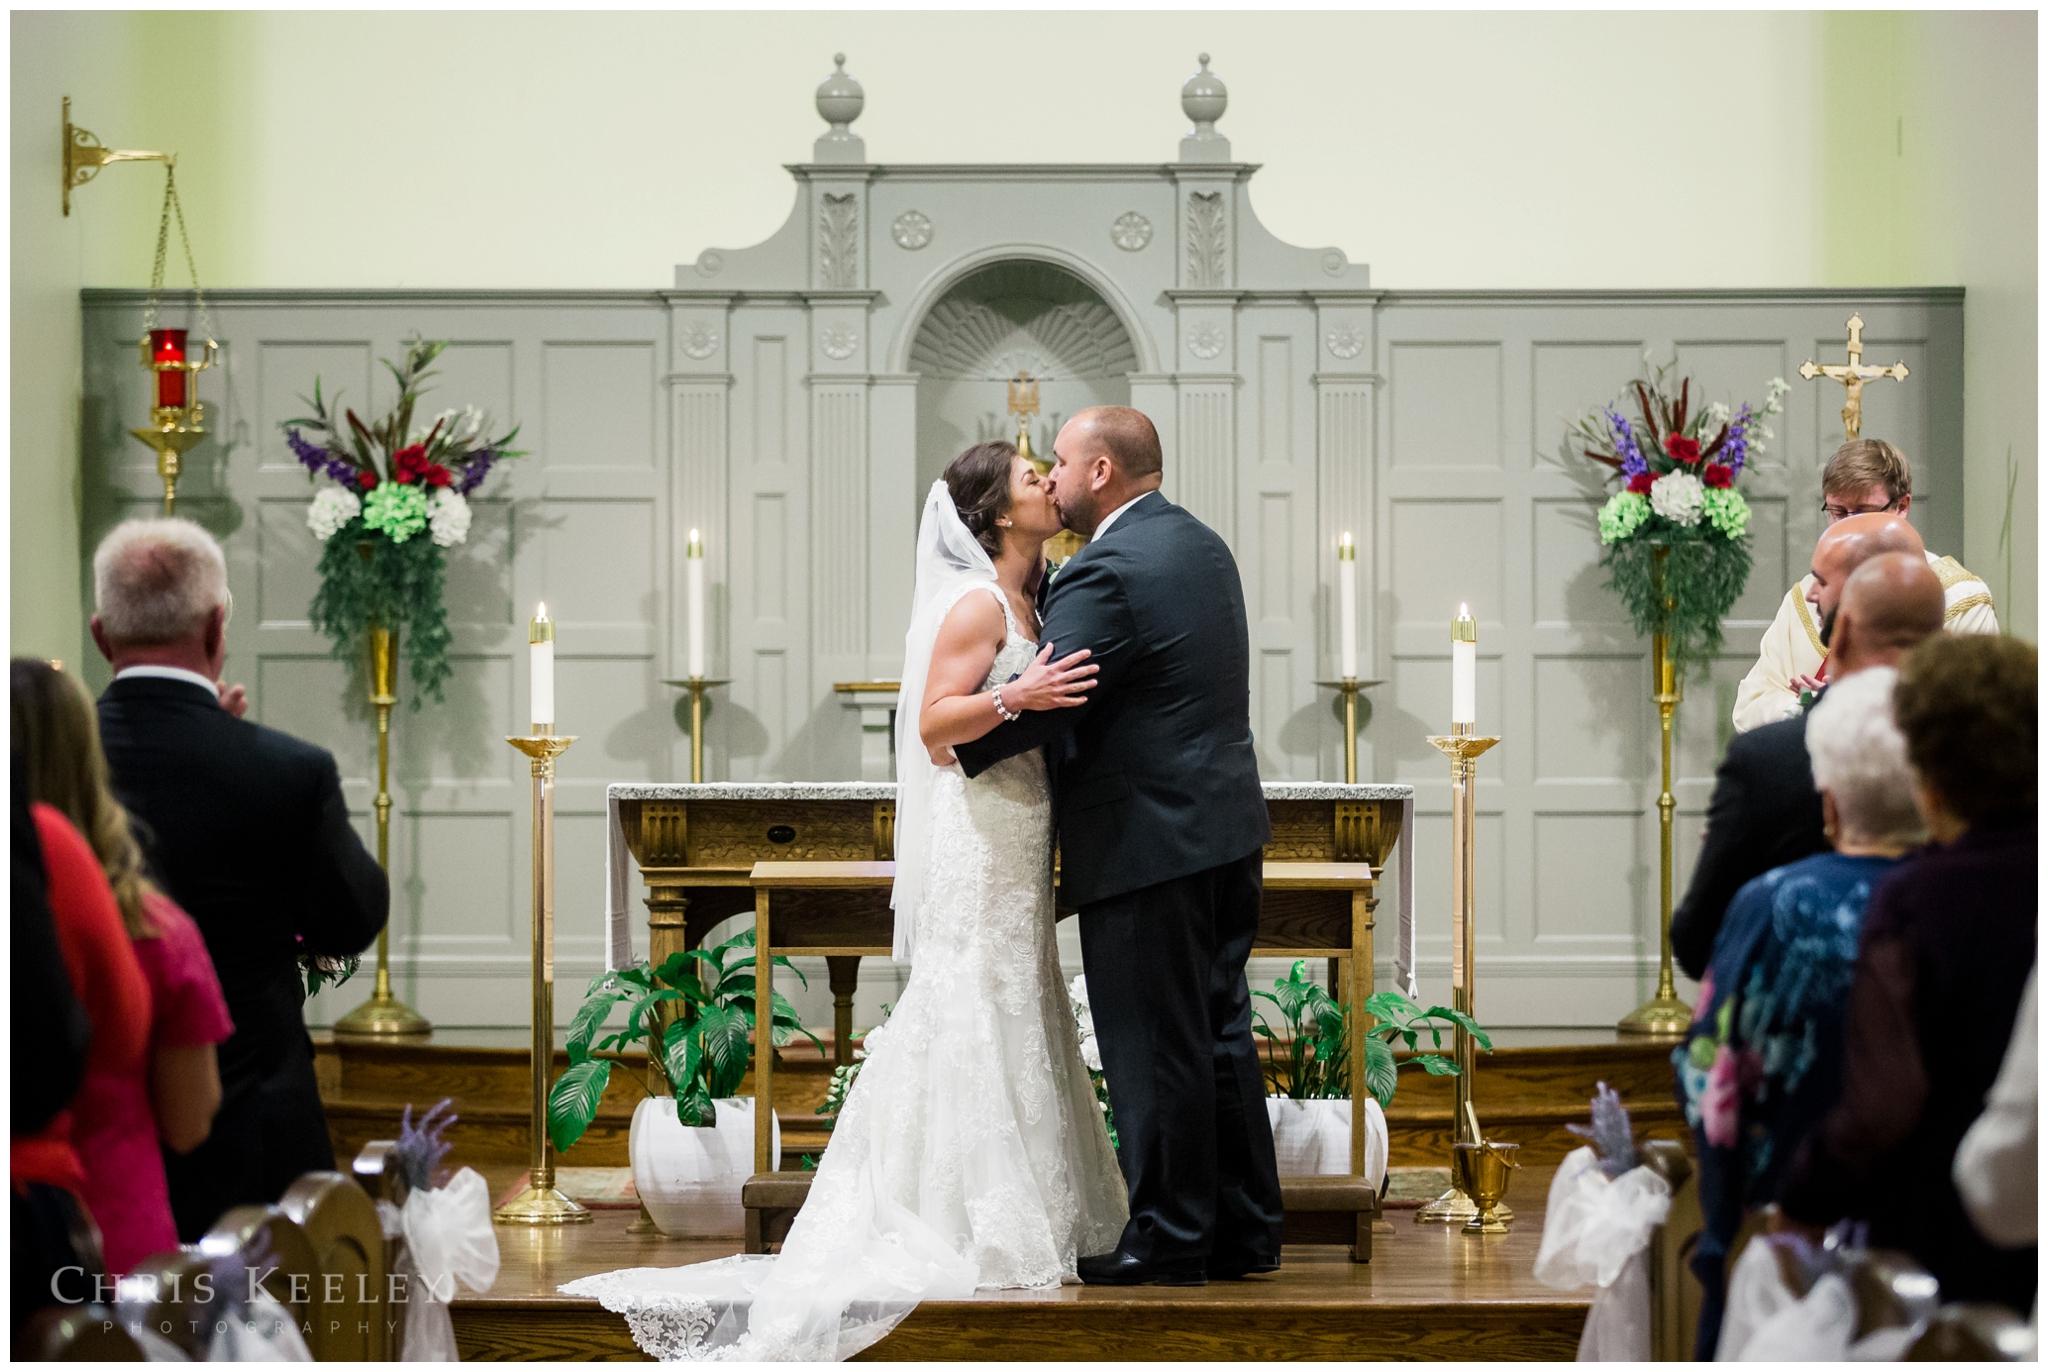 burrows-new-hampshire-wedding-photographer-chris-keeley-38.jpg